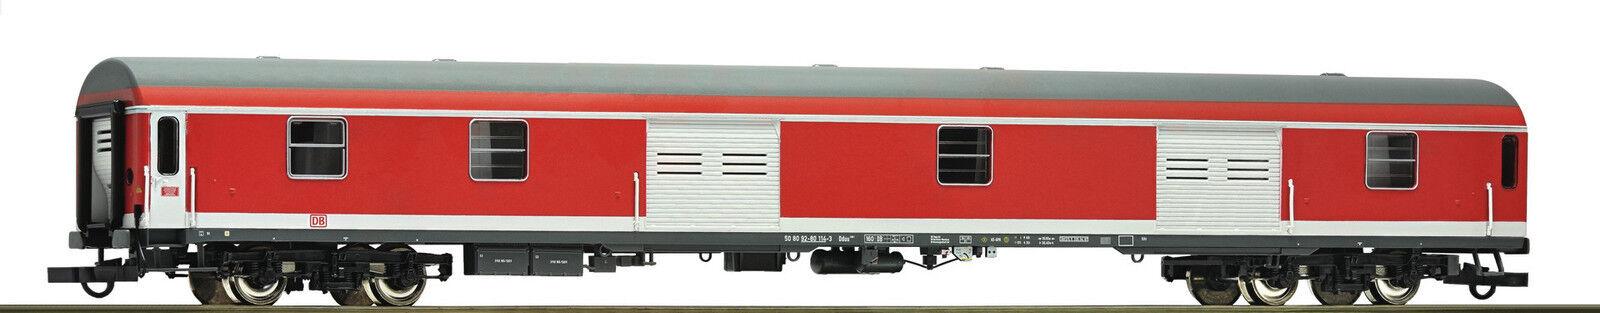 ROCO 64913 vagone Borsaagli DMS 922 DB-Regio delle DB AG Ep. V nuovo OVP